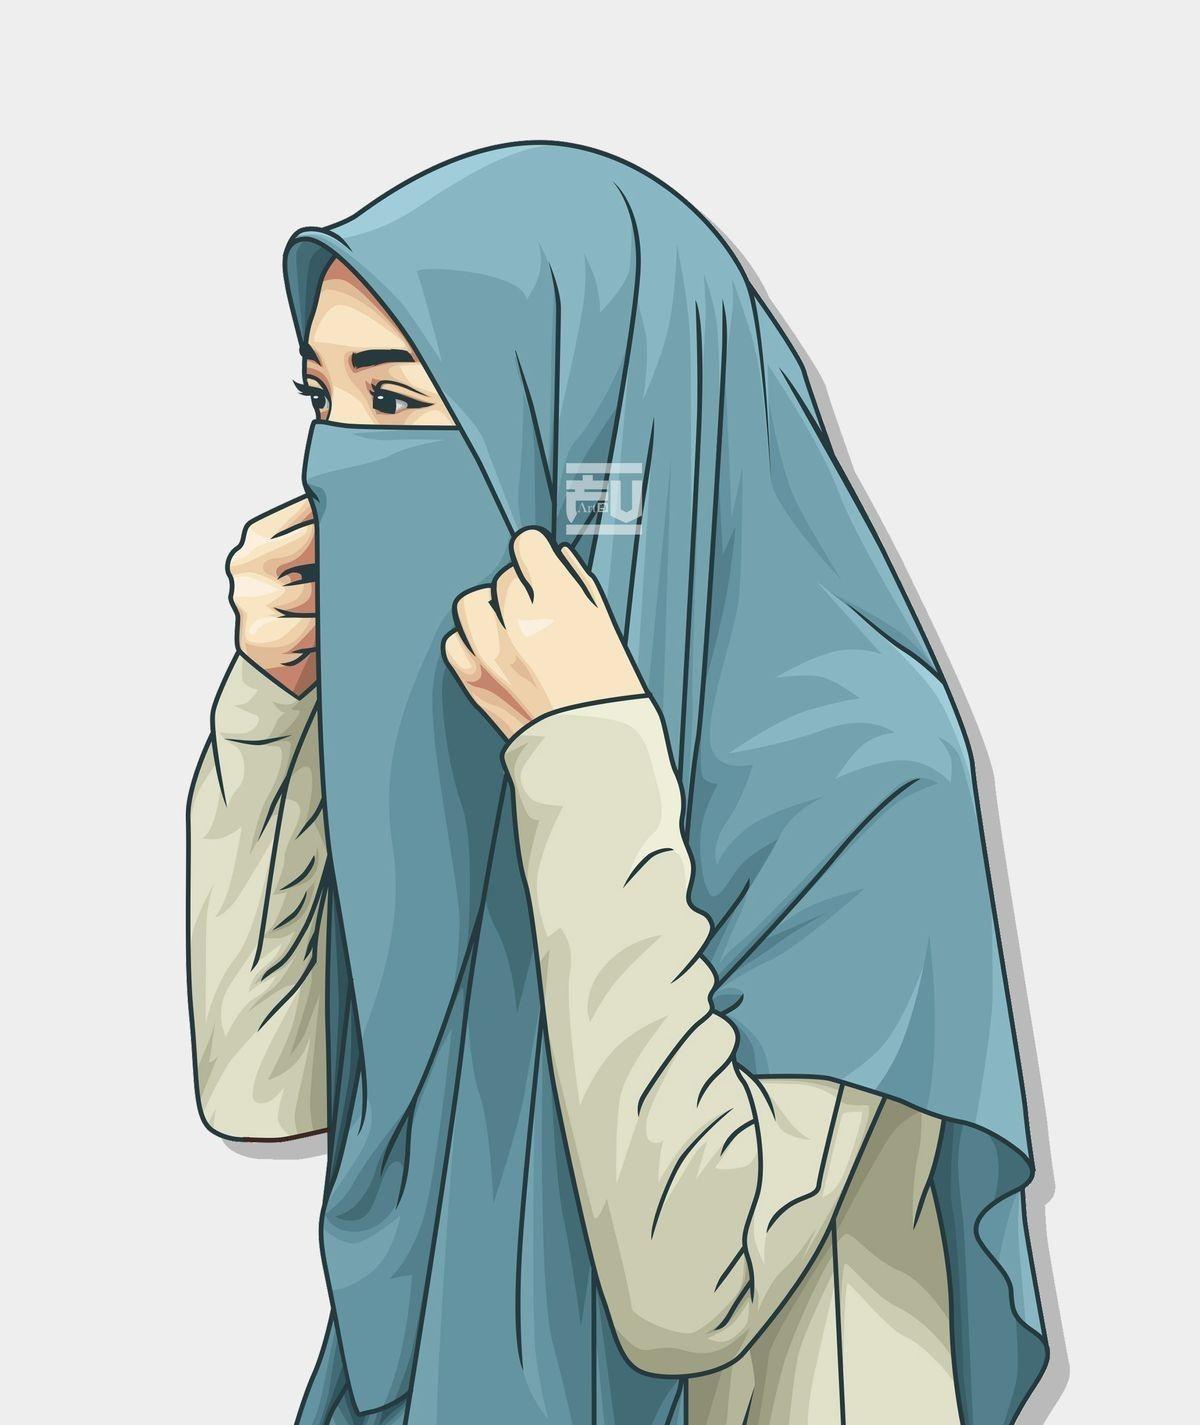 Unduh 850 Gambar Animasi Hijab HD Paling Keren di 2020